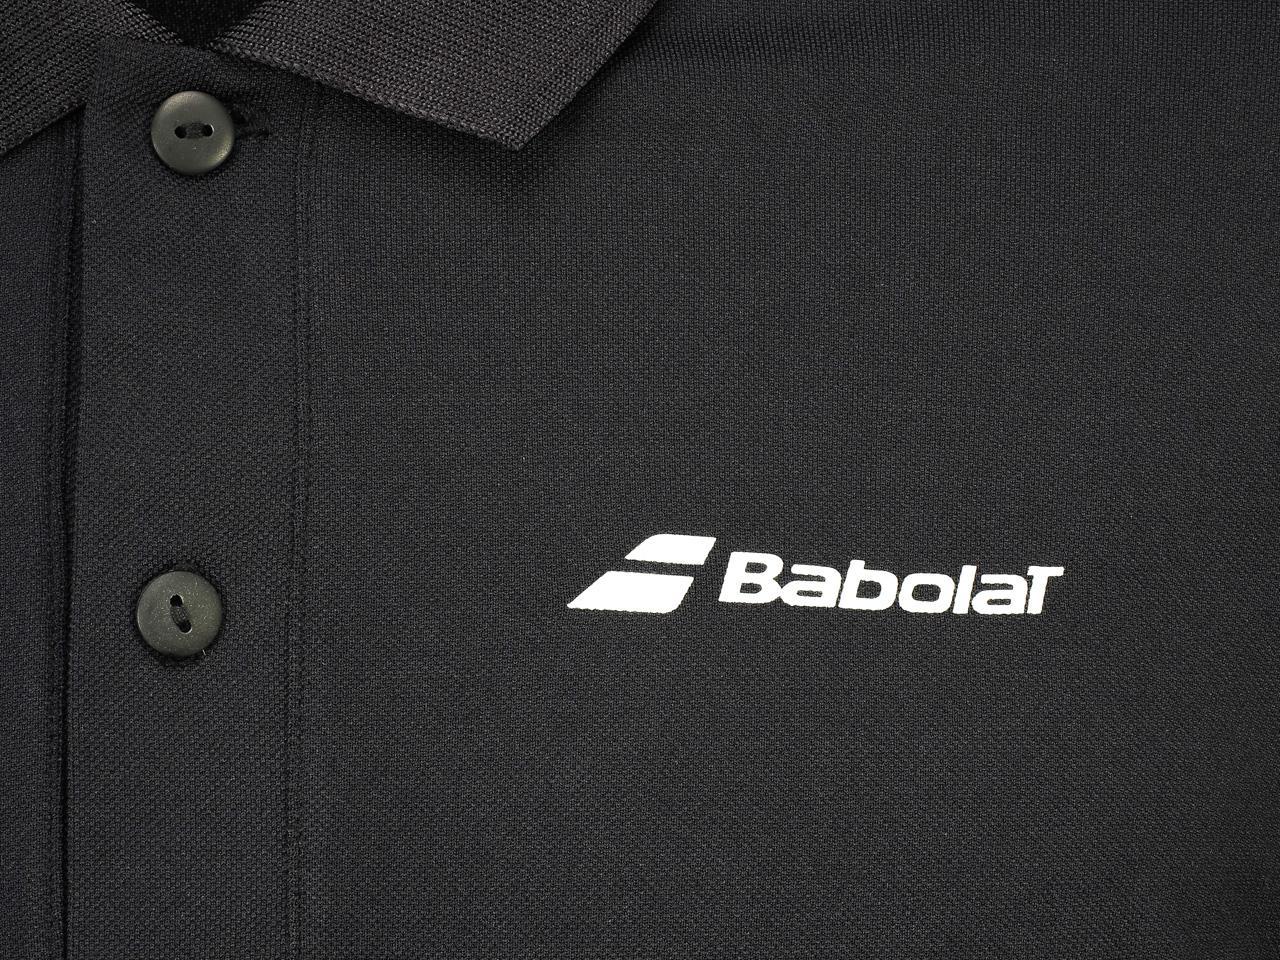 Polo-Tennis-Babolat-Polo-Core-Club-Black-Black-70103-New thumbnail 3